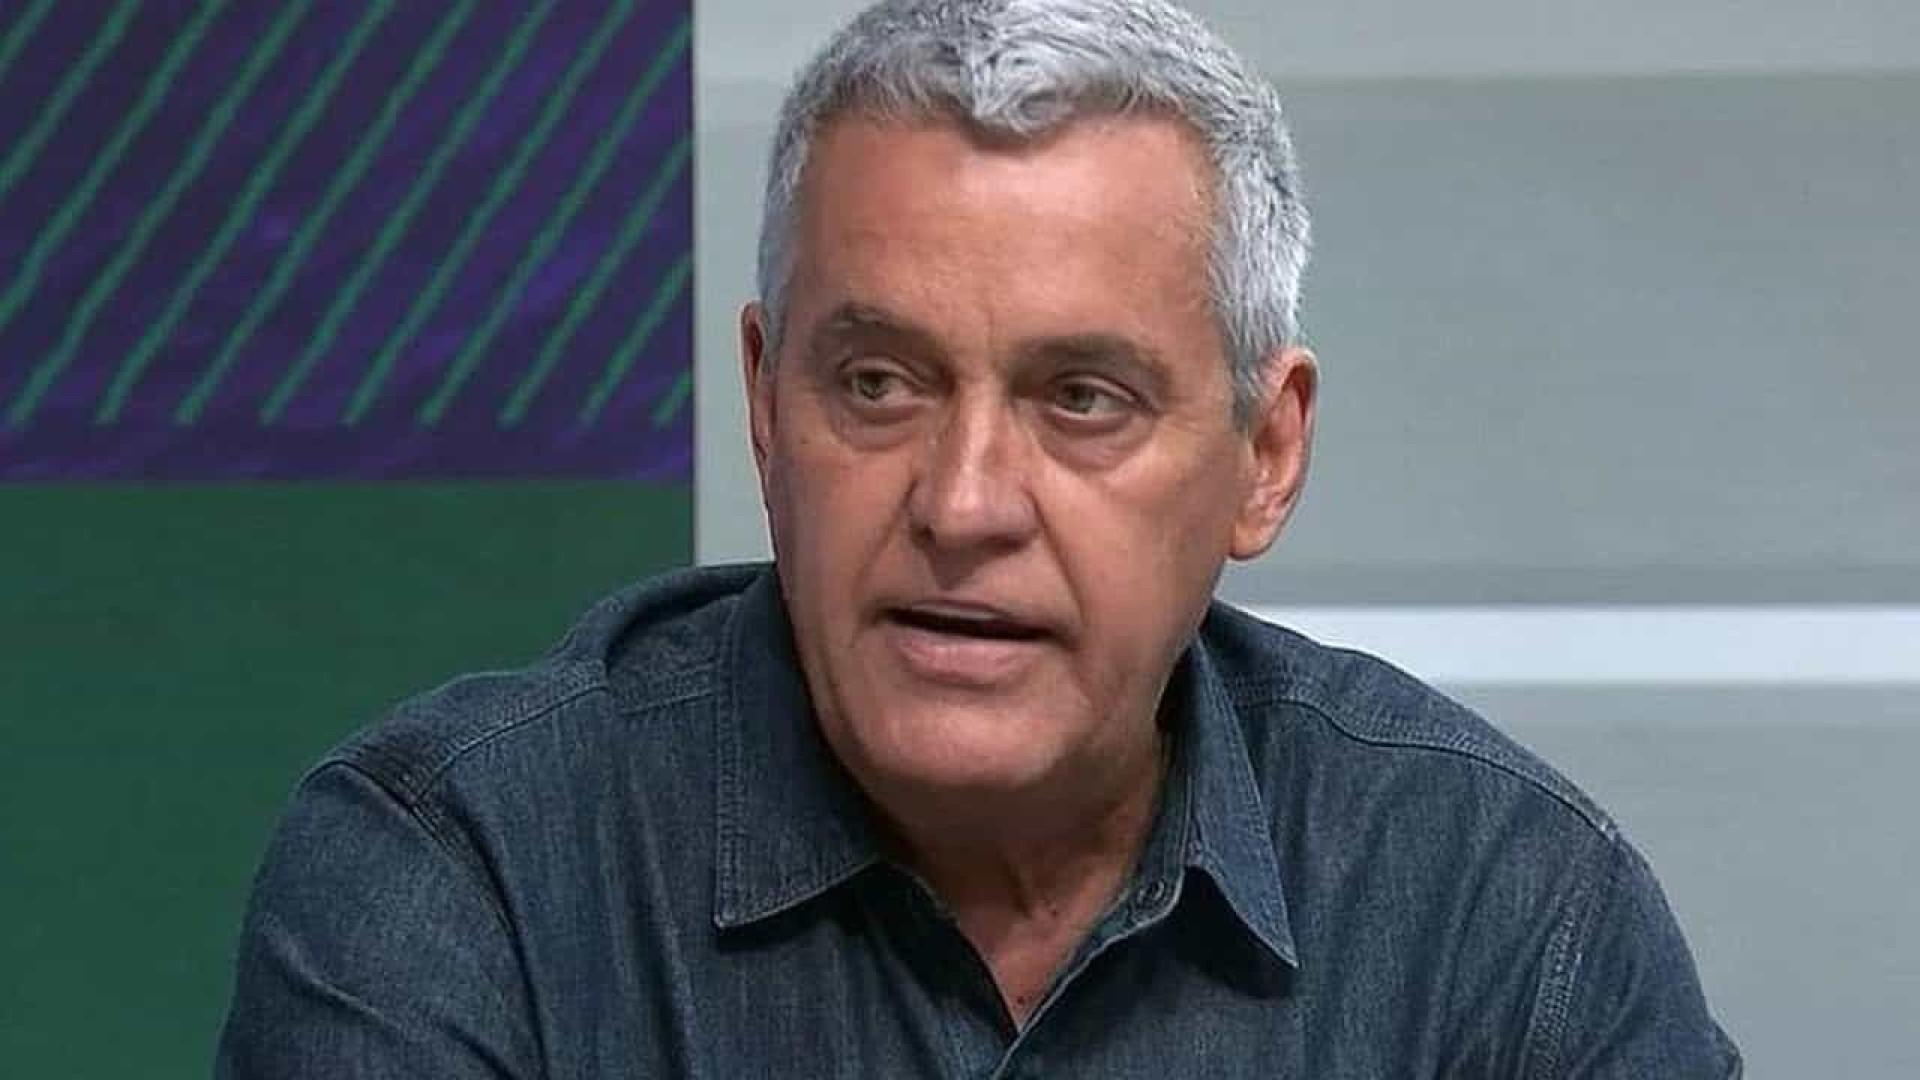 Clima fica tenso na Globo após polêmica de Mauro Naves no caso Neymar